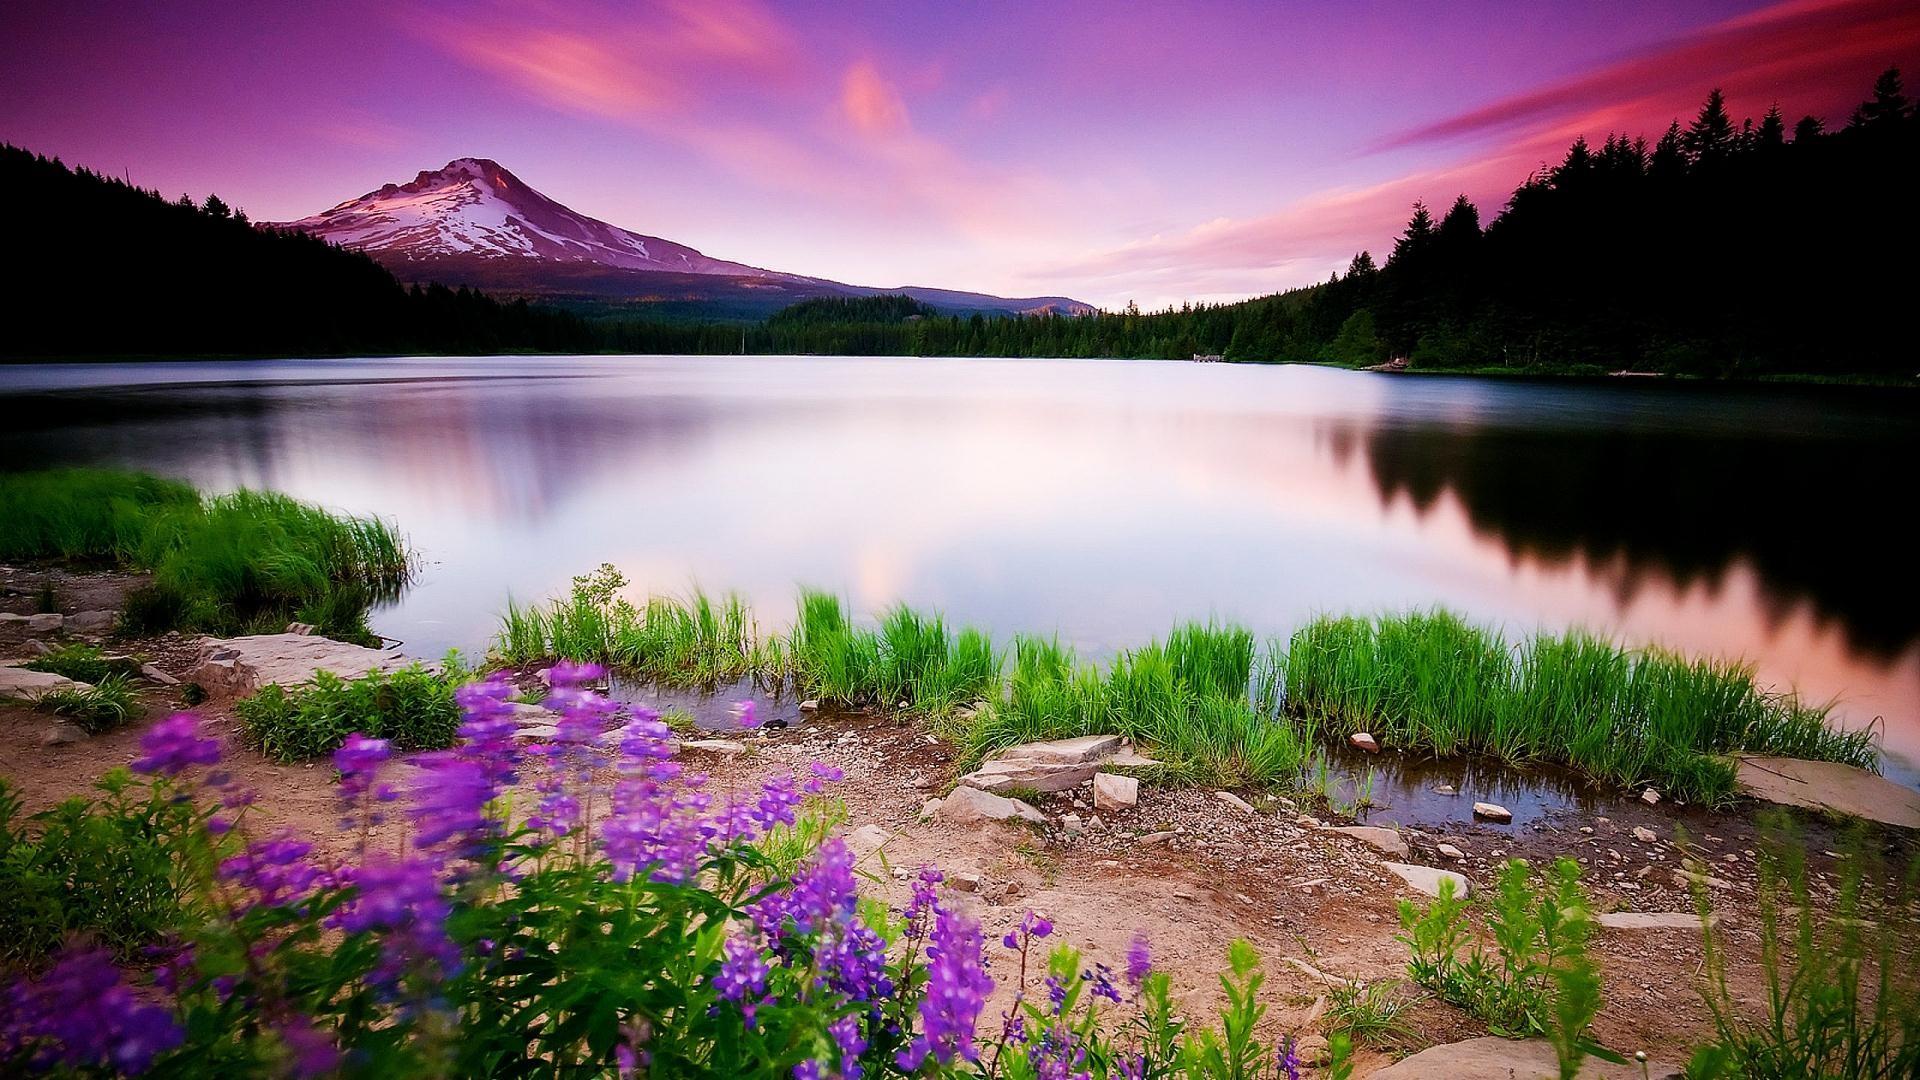 natural-landscape-purple-lake-wallpaper-